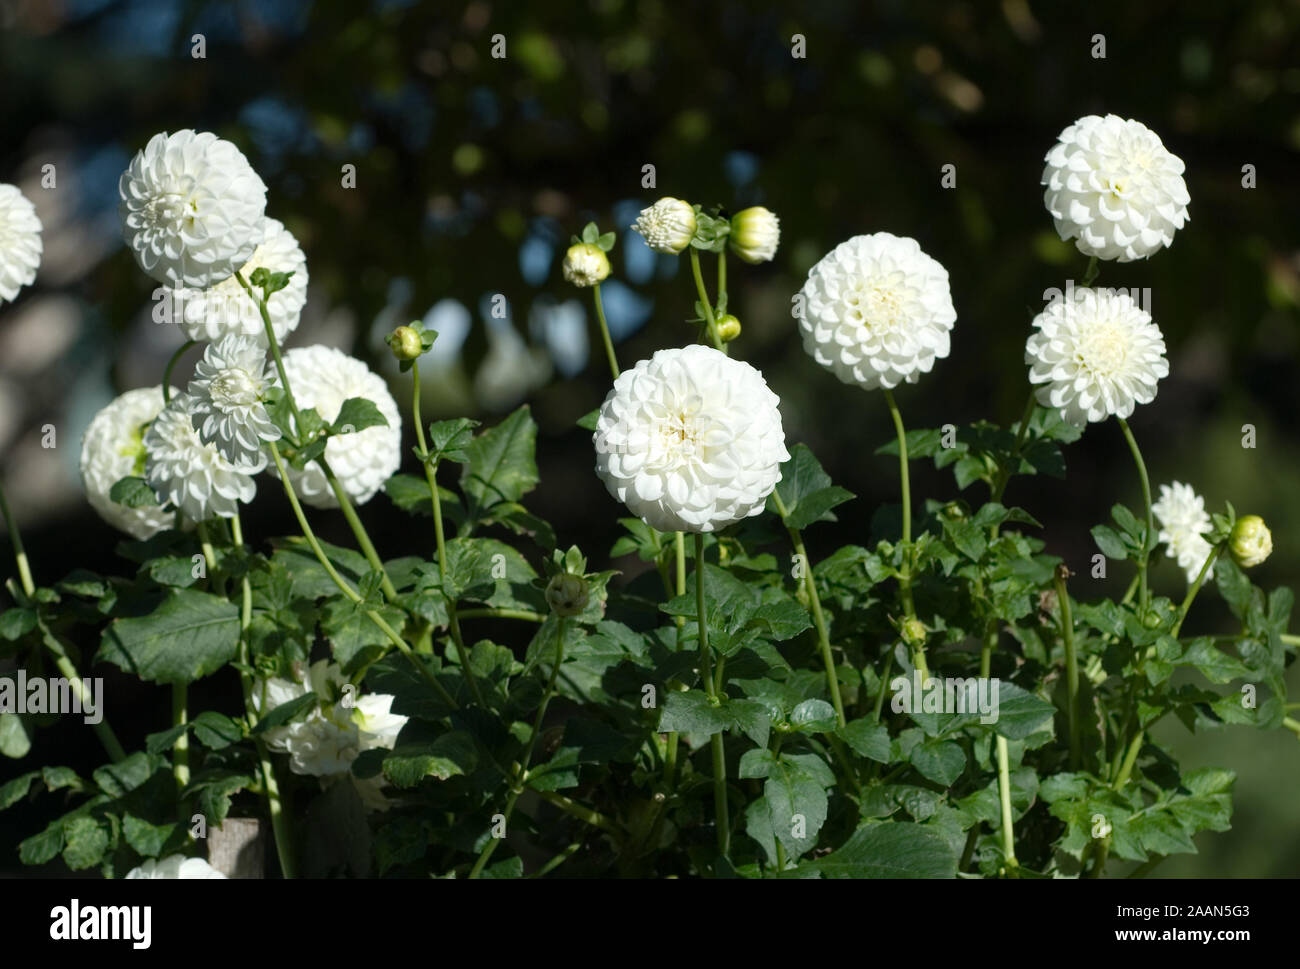 Garden Bed Of White Dahlia Flowers Stock Photo Alamy